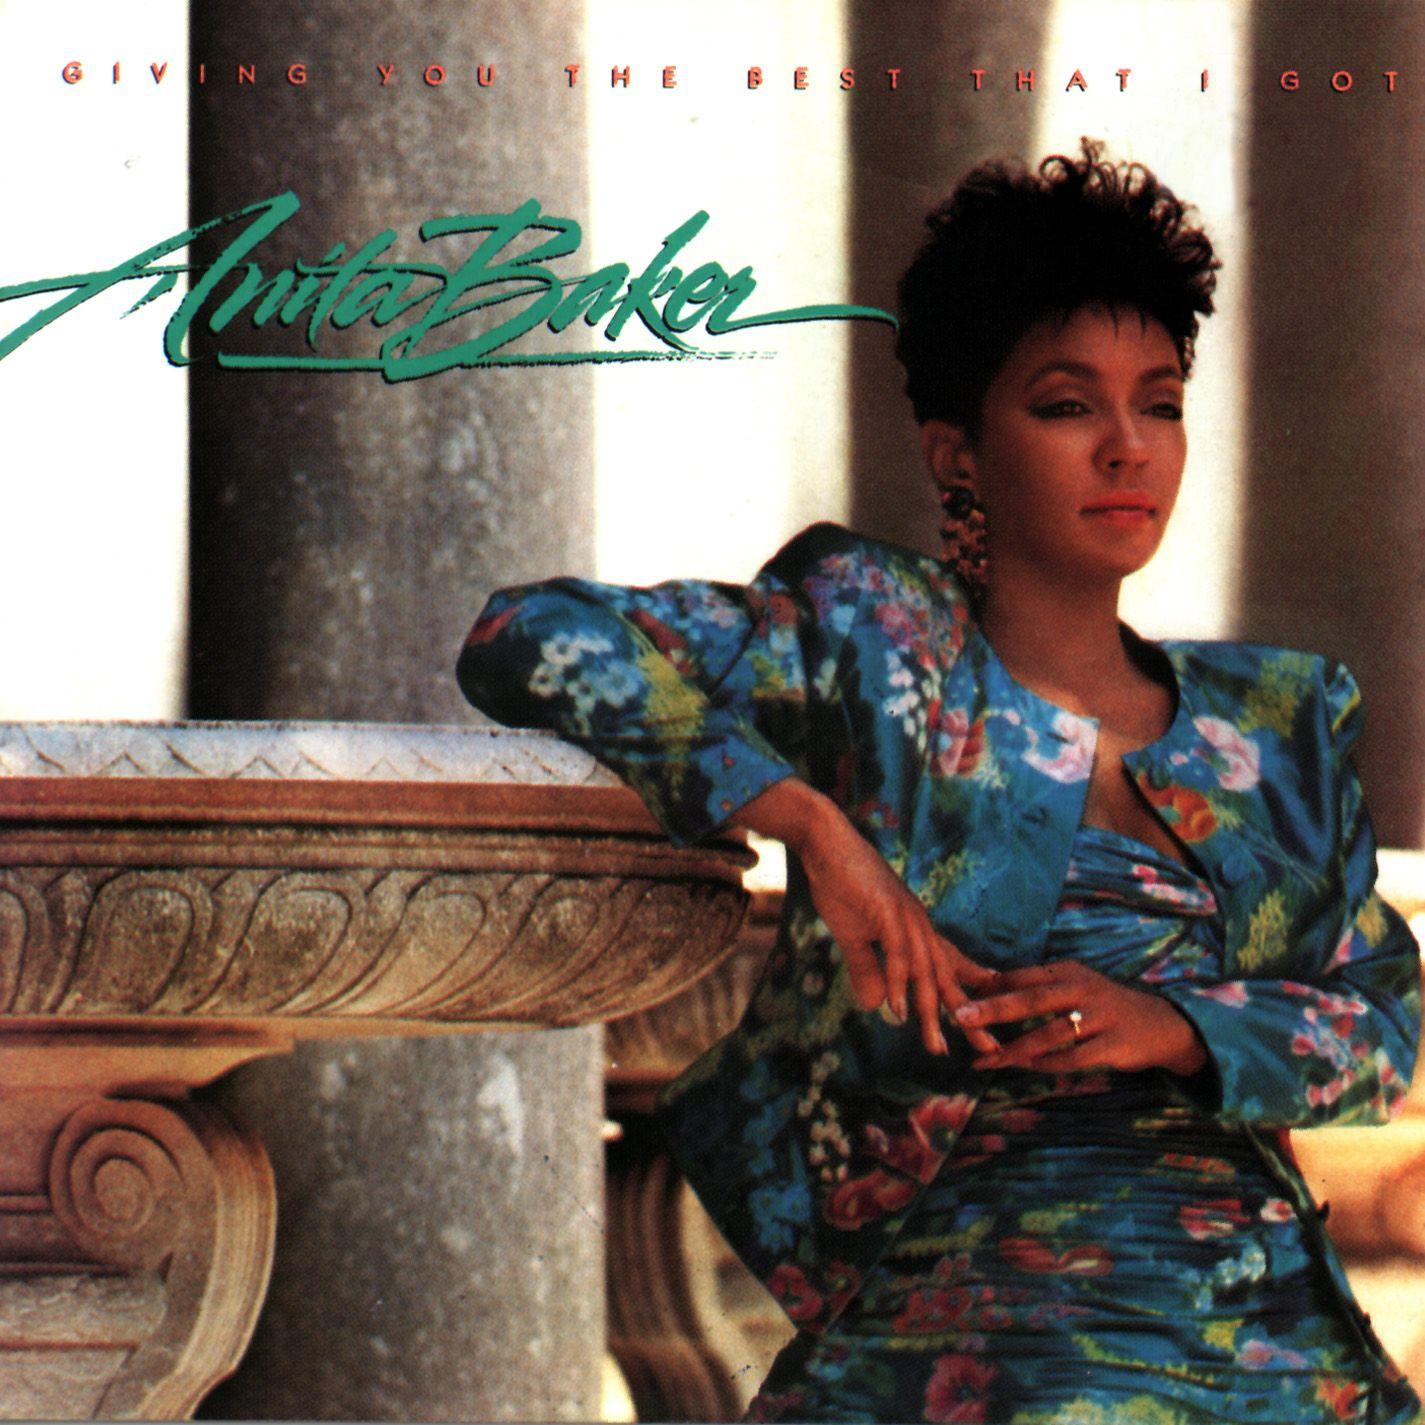 Anita Baker - Just Because MP3 Download and Lyrics